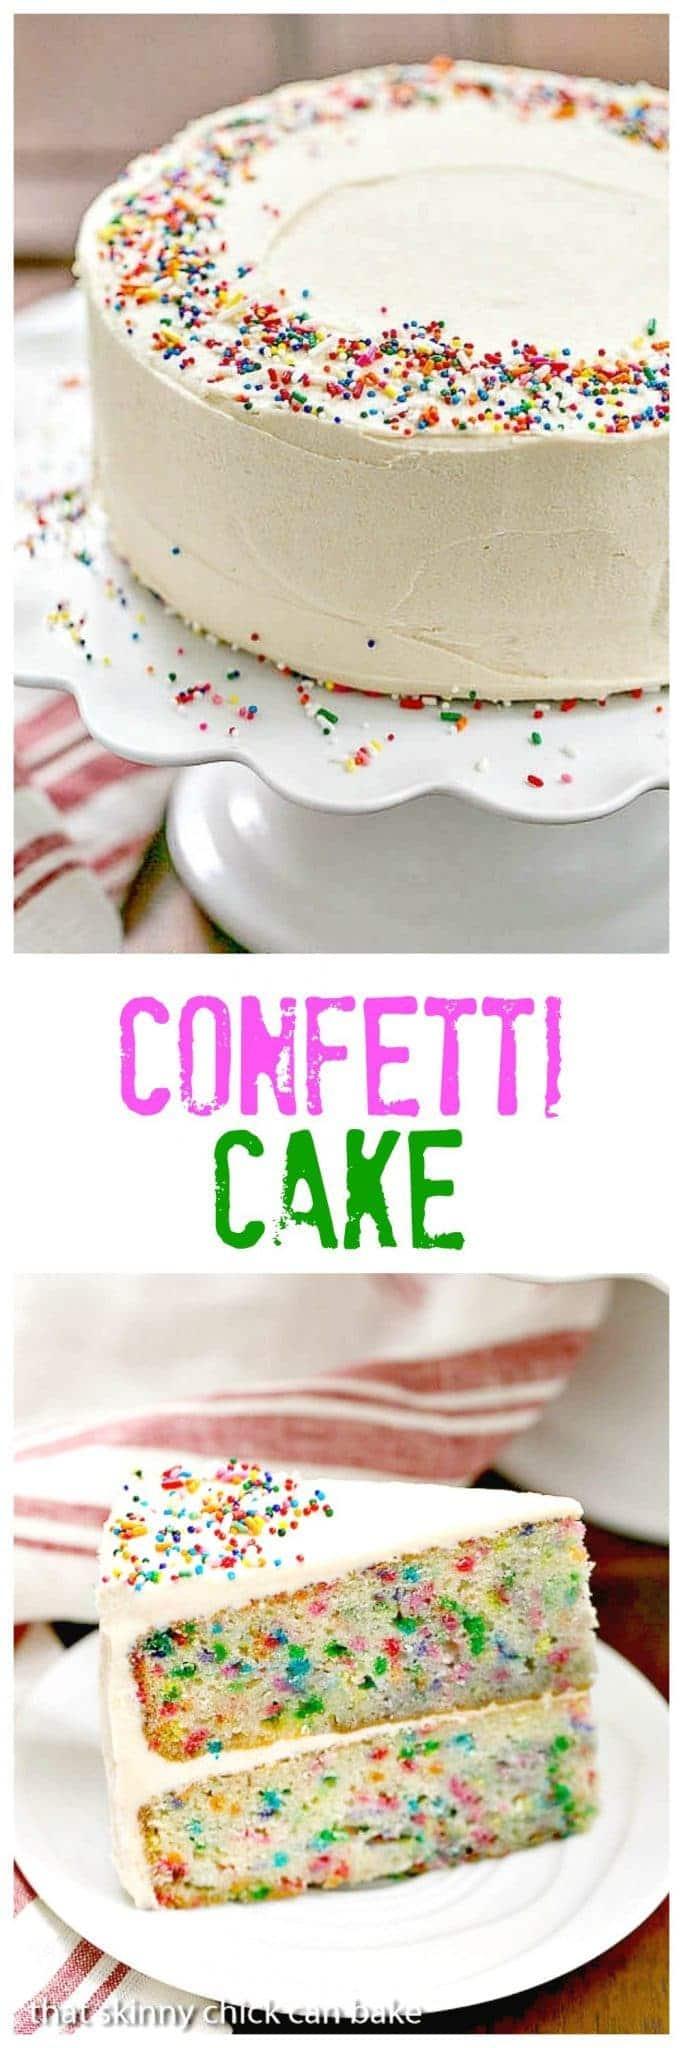 Extra Moist Confetti Cake